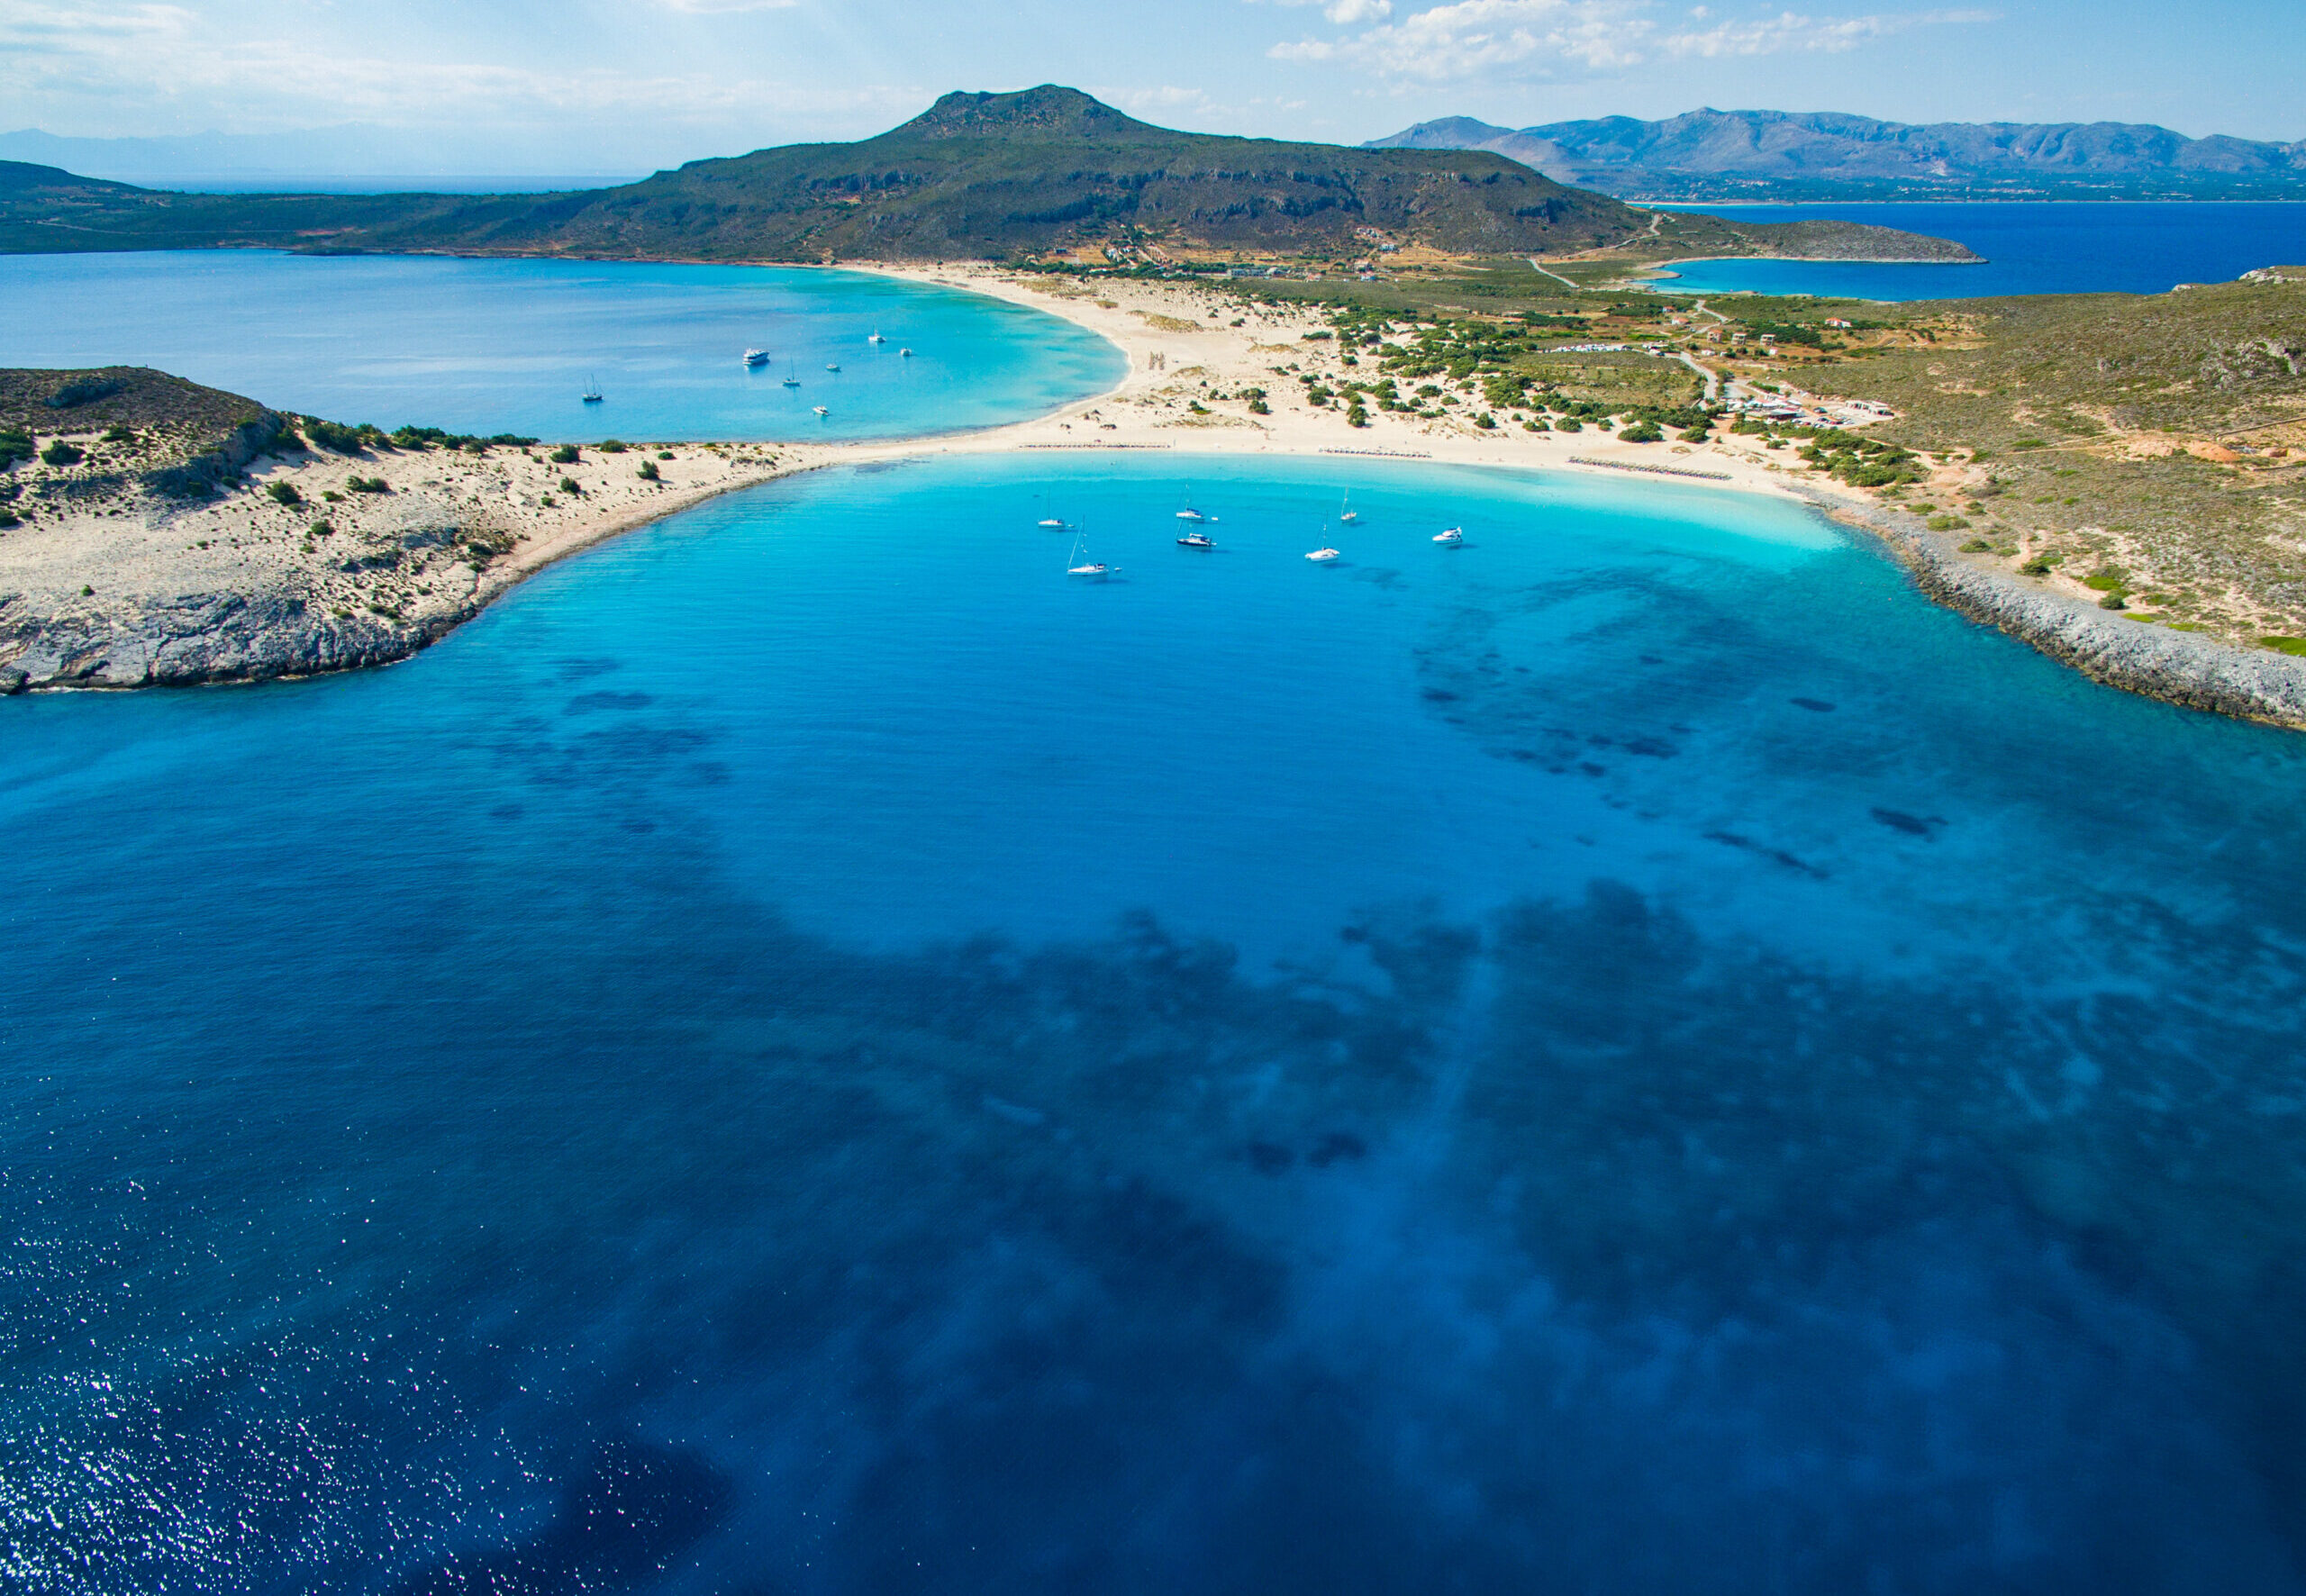 Simos: 1.5 km turquoise beach and white sand